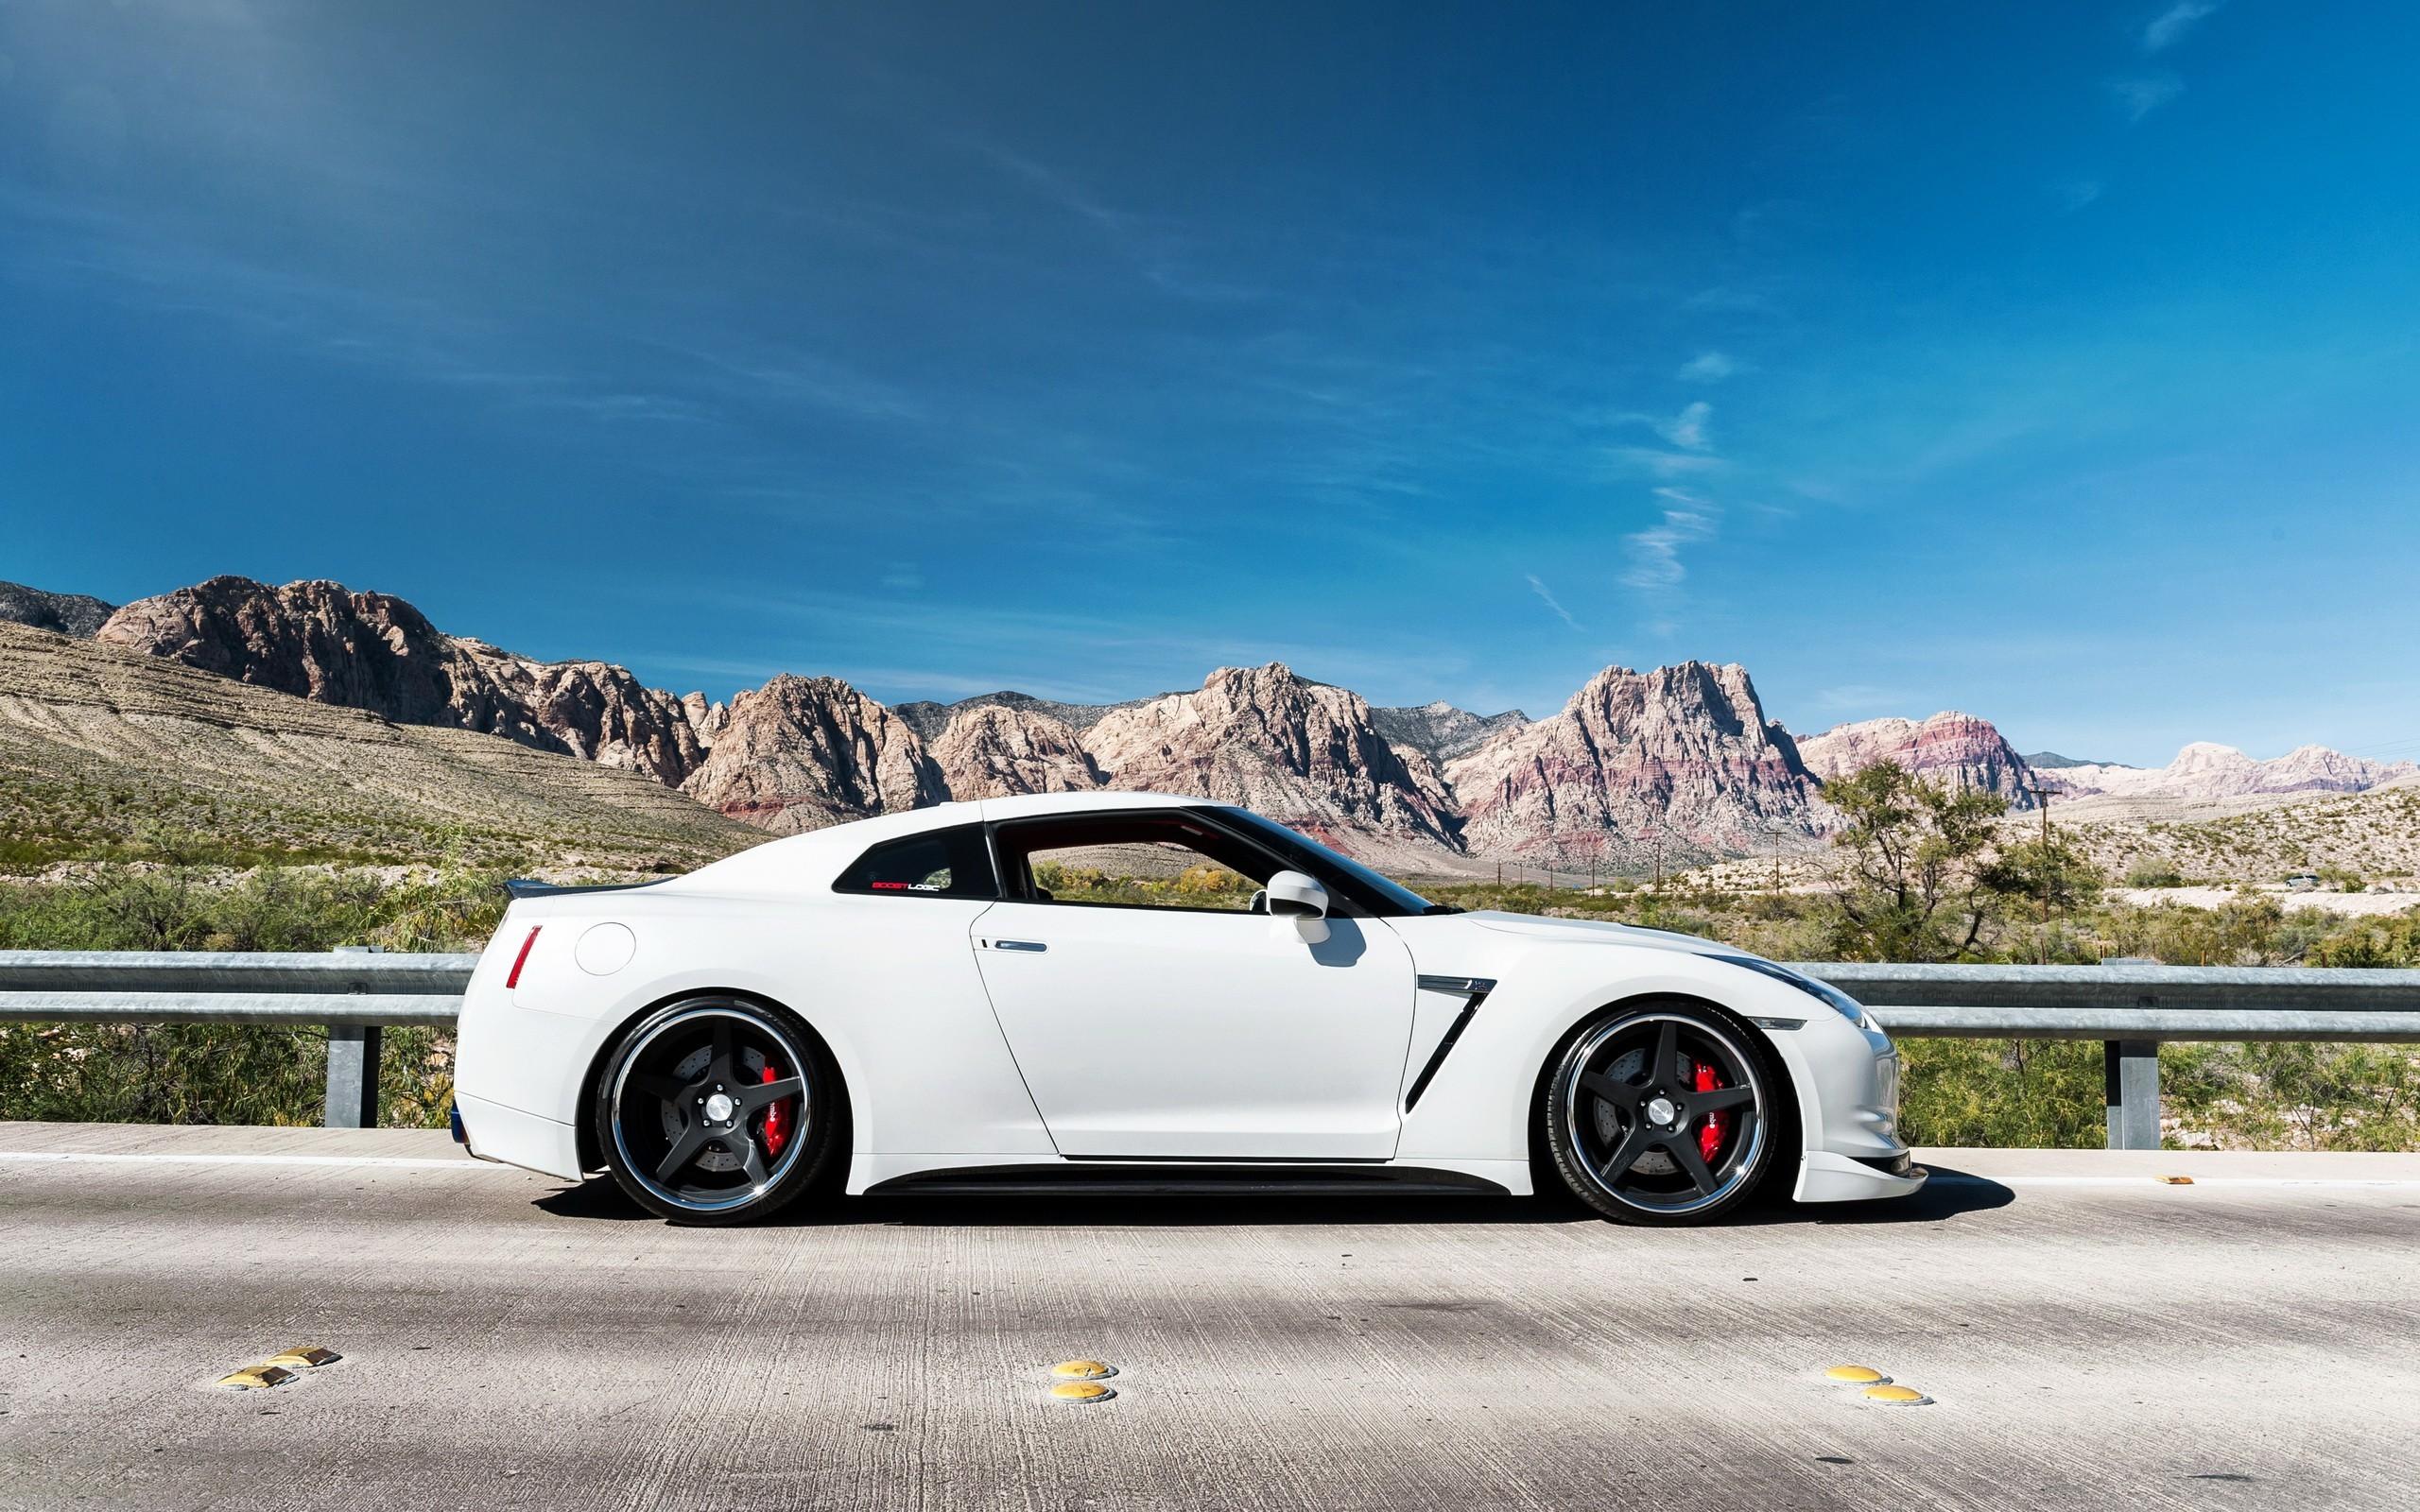 General 2560x1600 Nissan GT-R car Nissan vehicle white cars